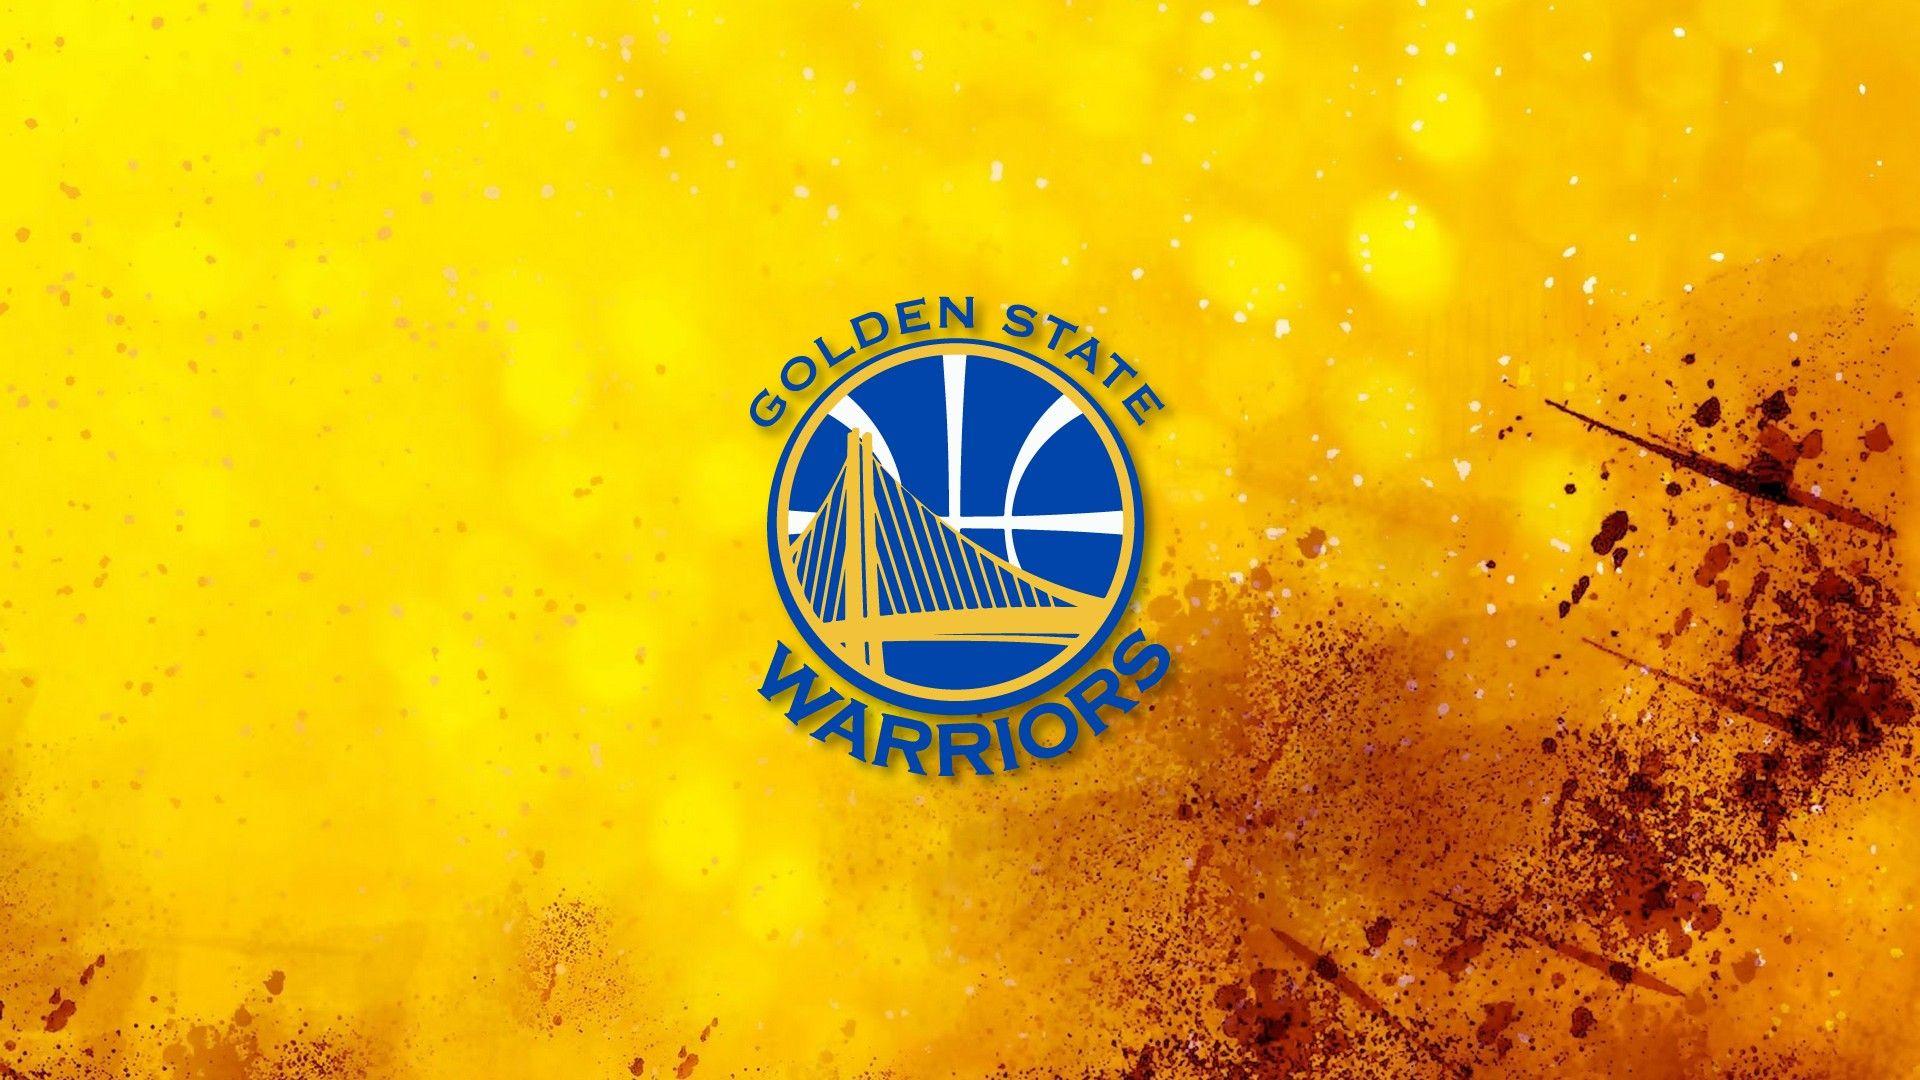 Golden State Warriors 2021 Wallpapers Wallpaper Cave